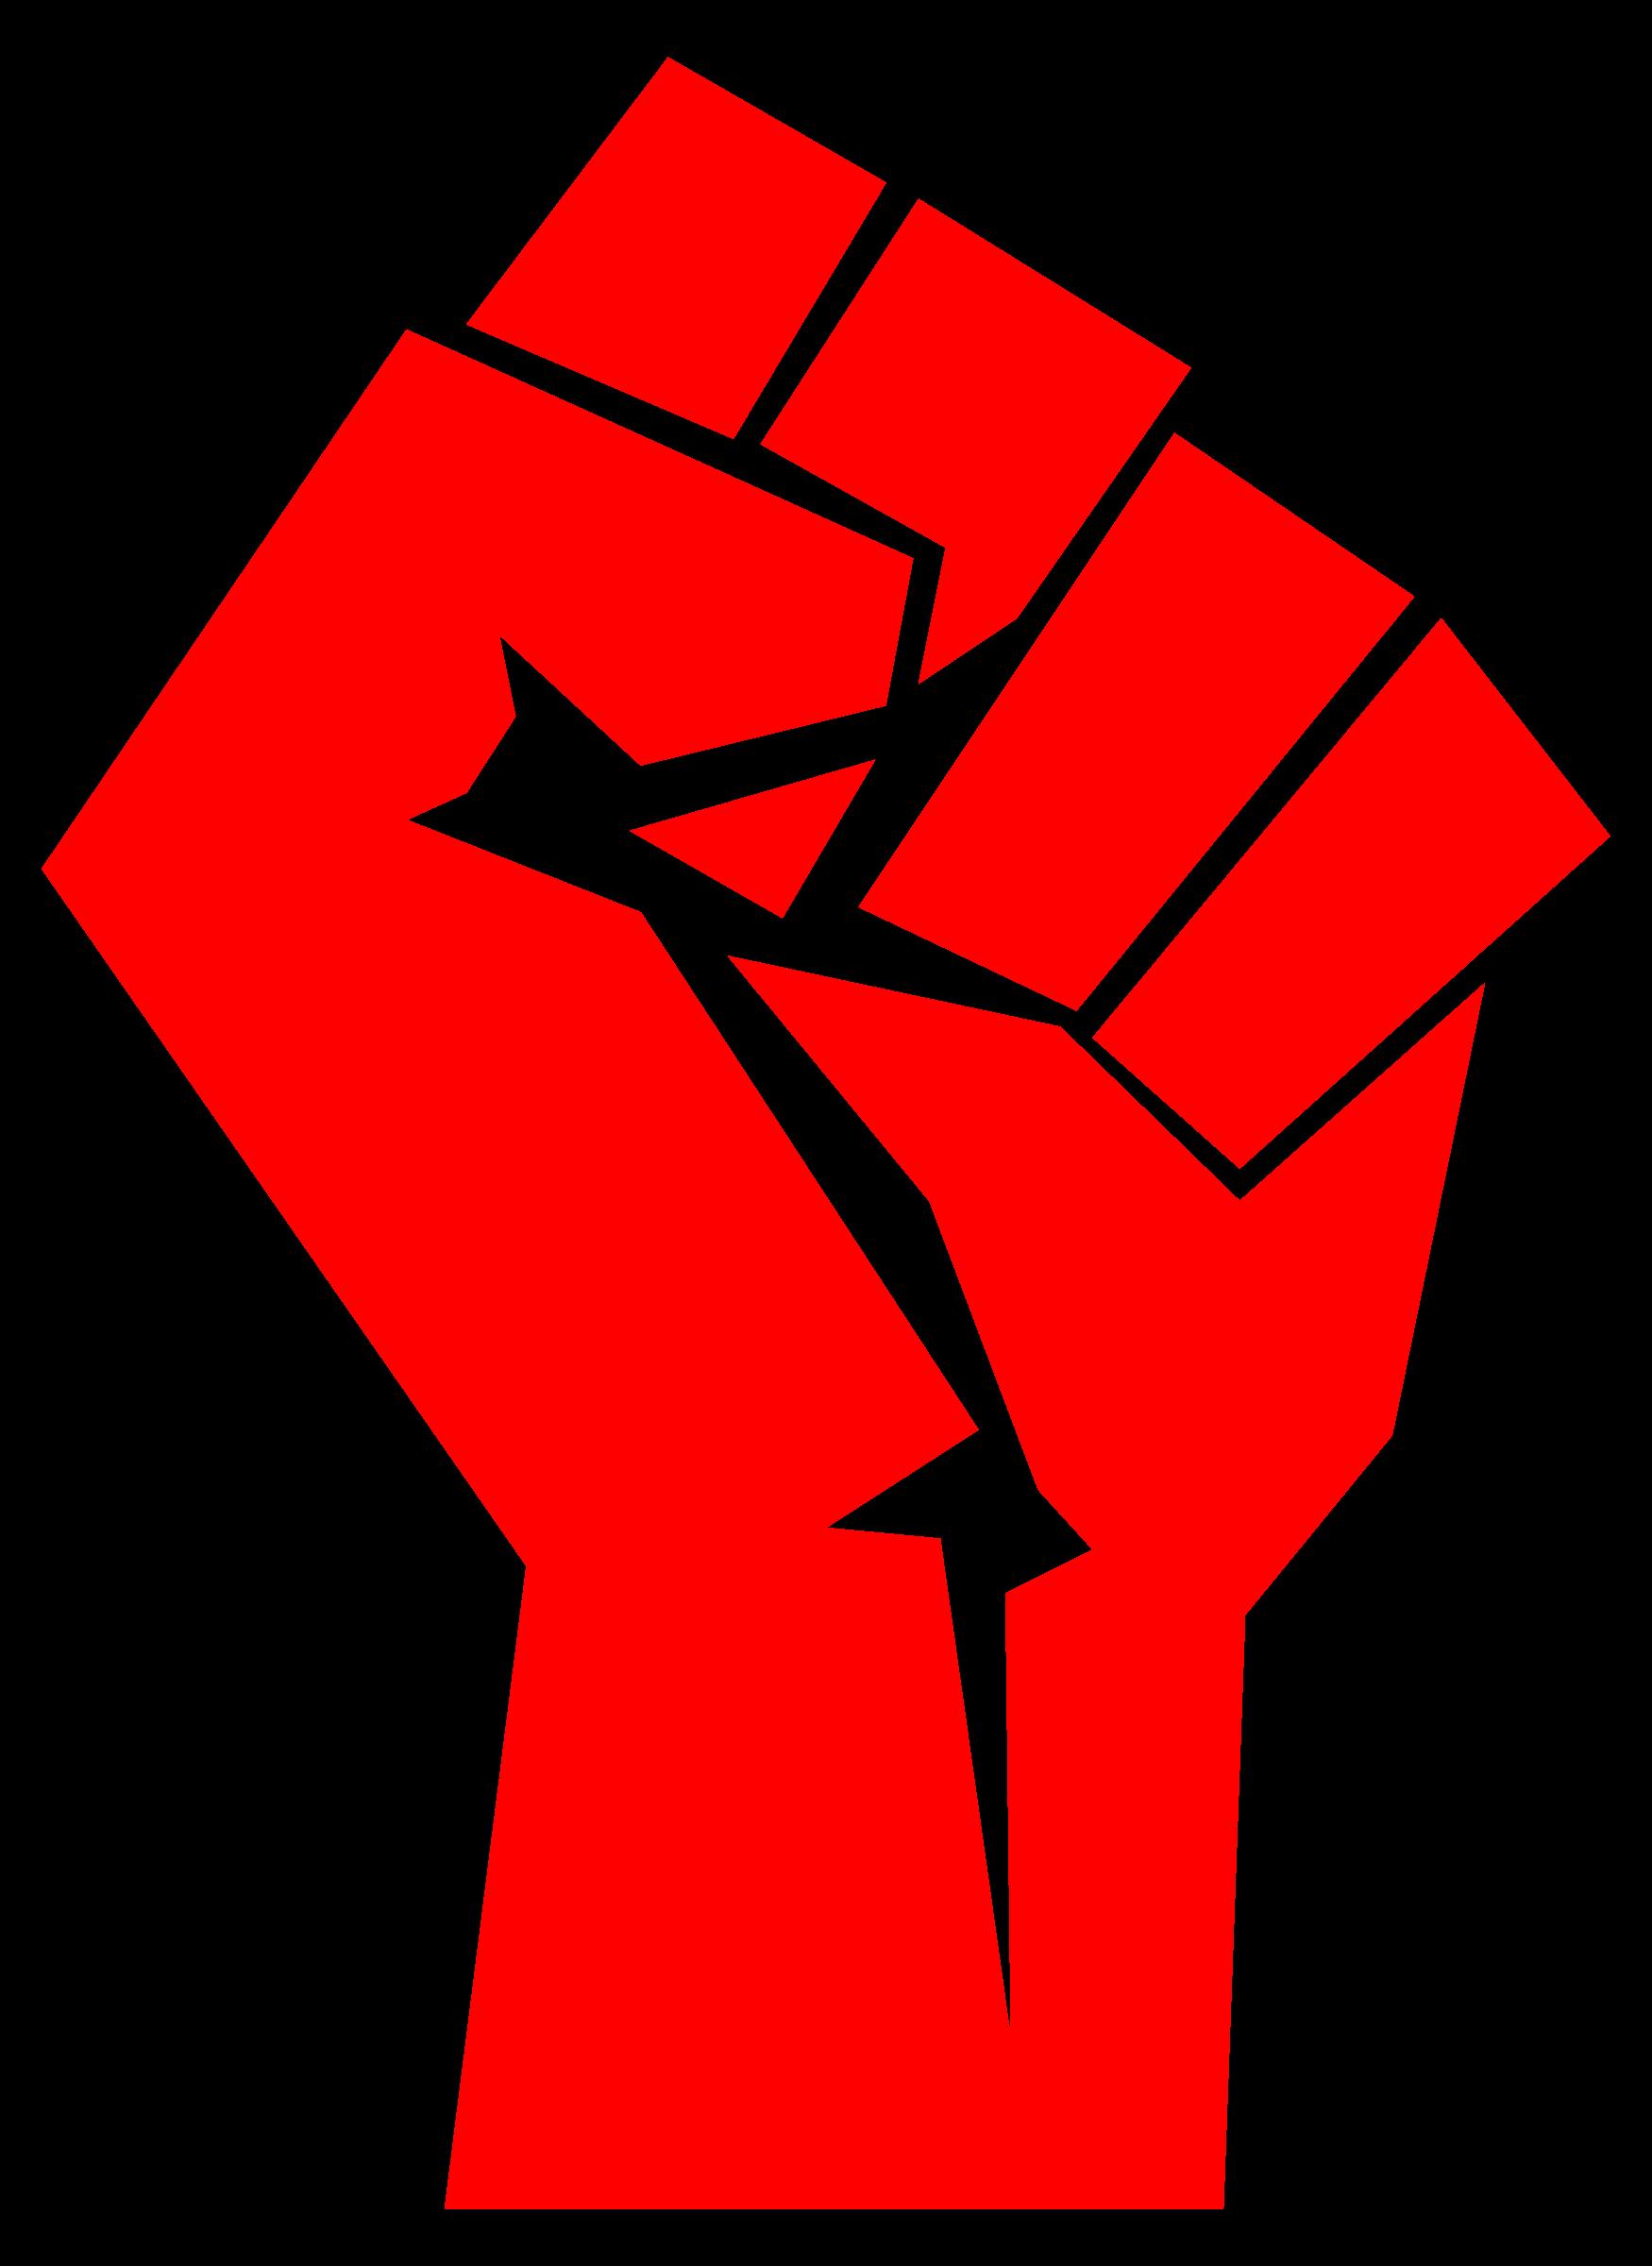 Big image png. Fist clipart revolution fist